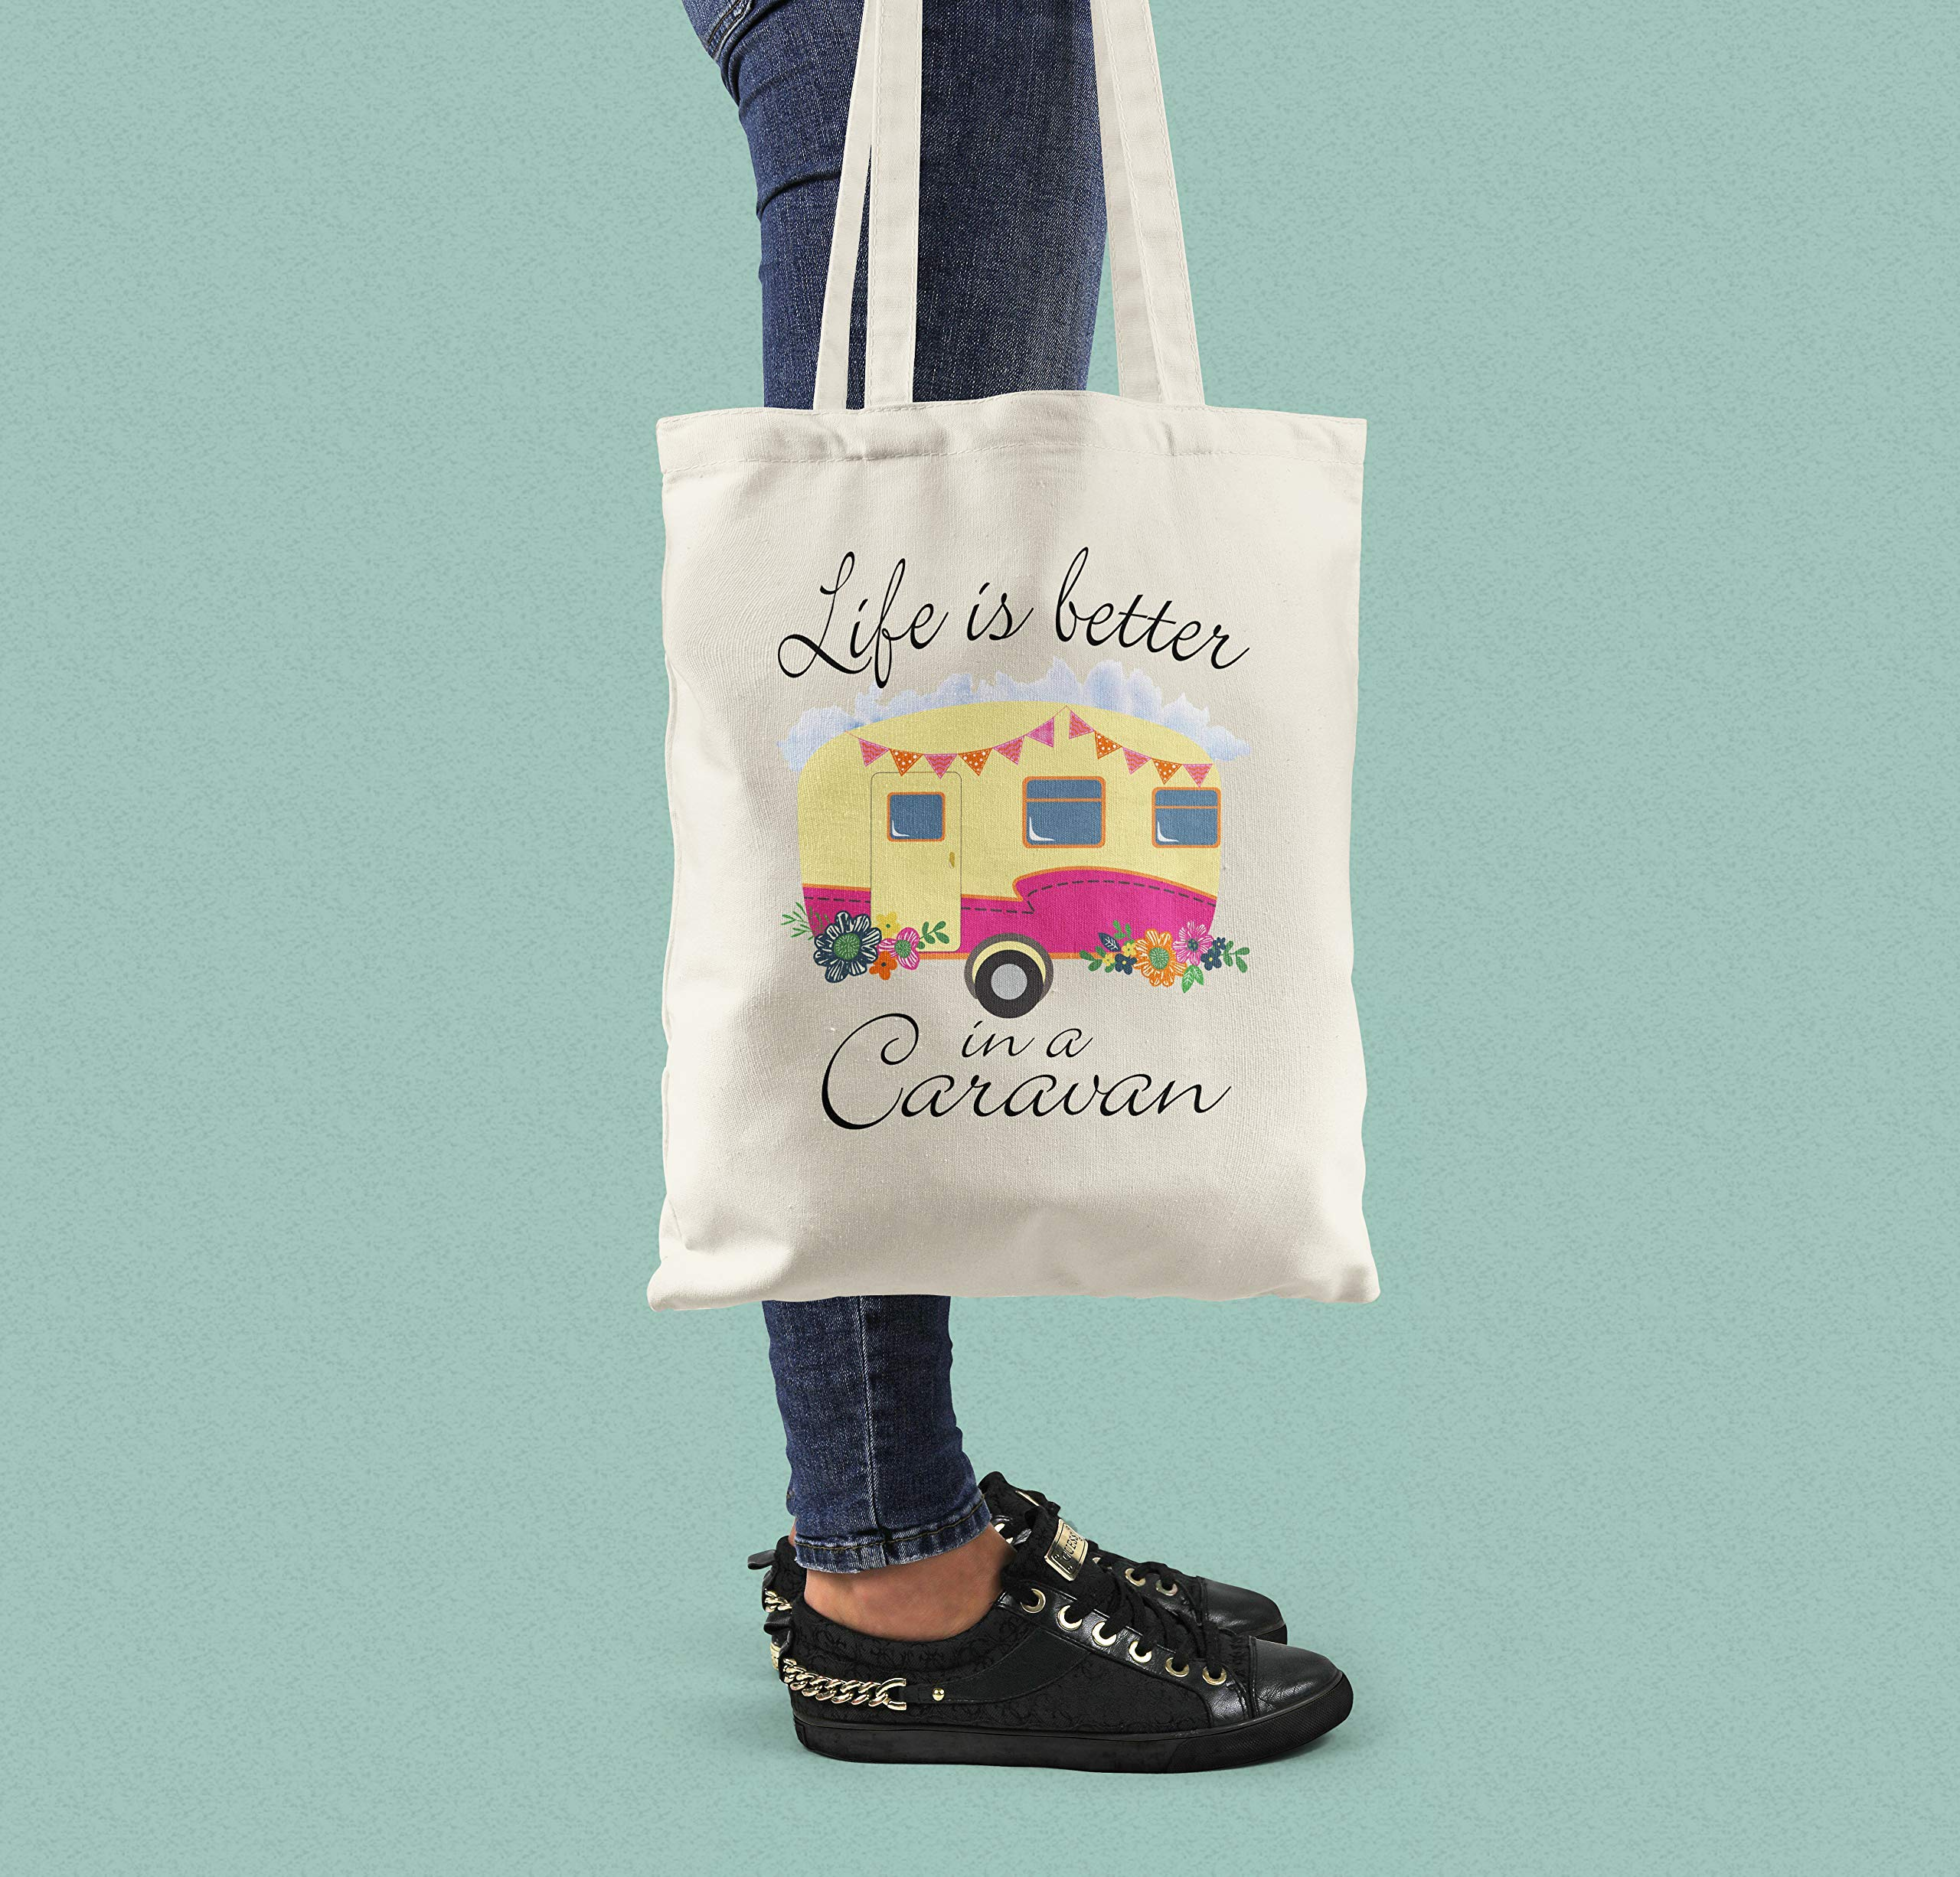 Life is Better in a Caravan Cotton Shopping Bag - handmade-bags